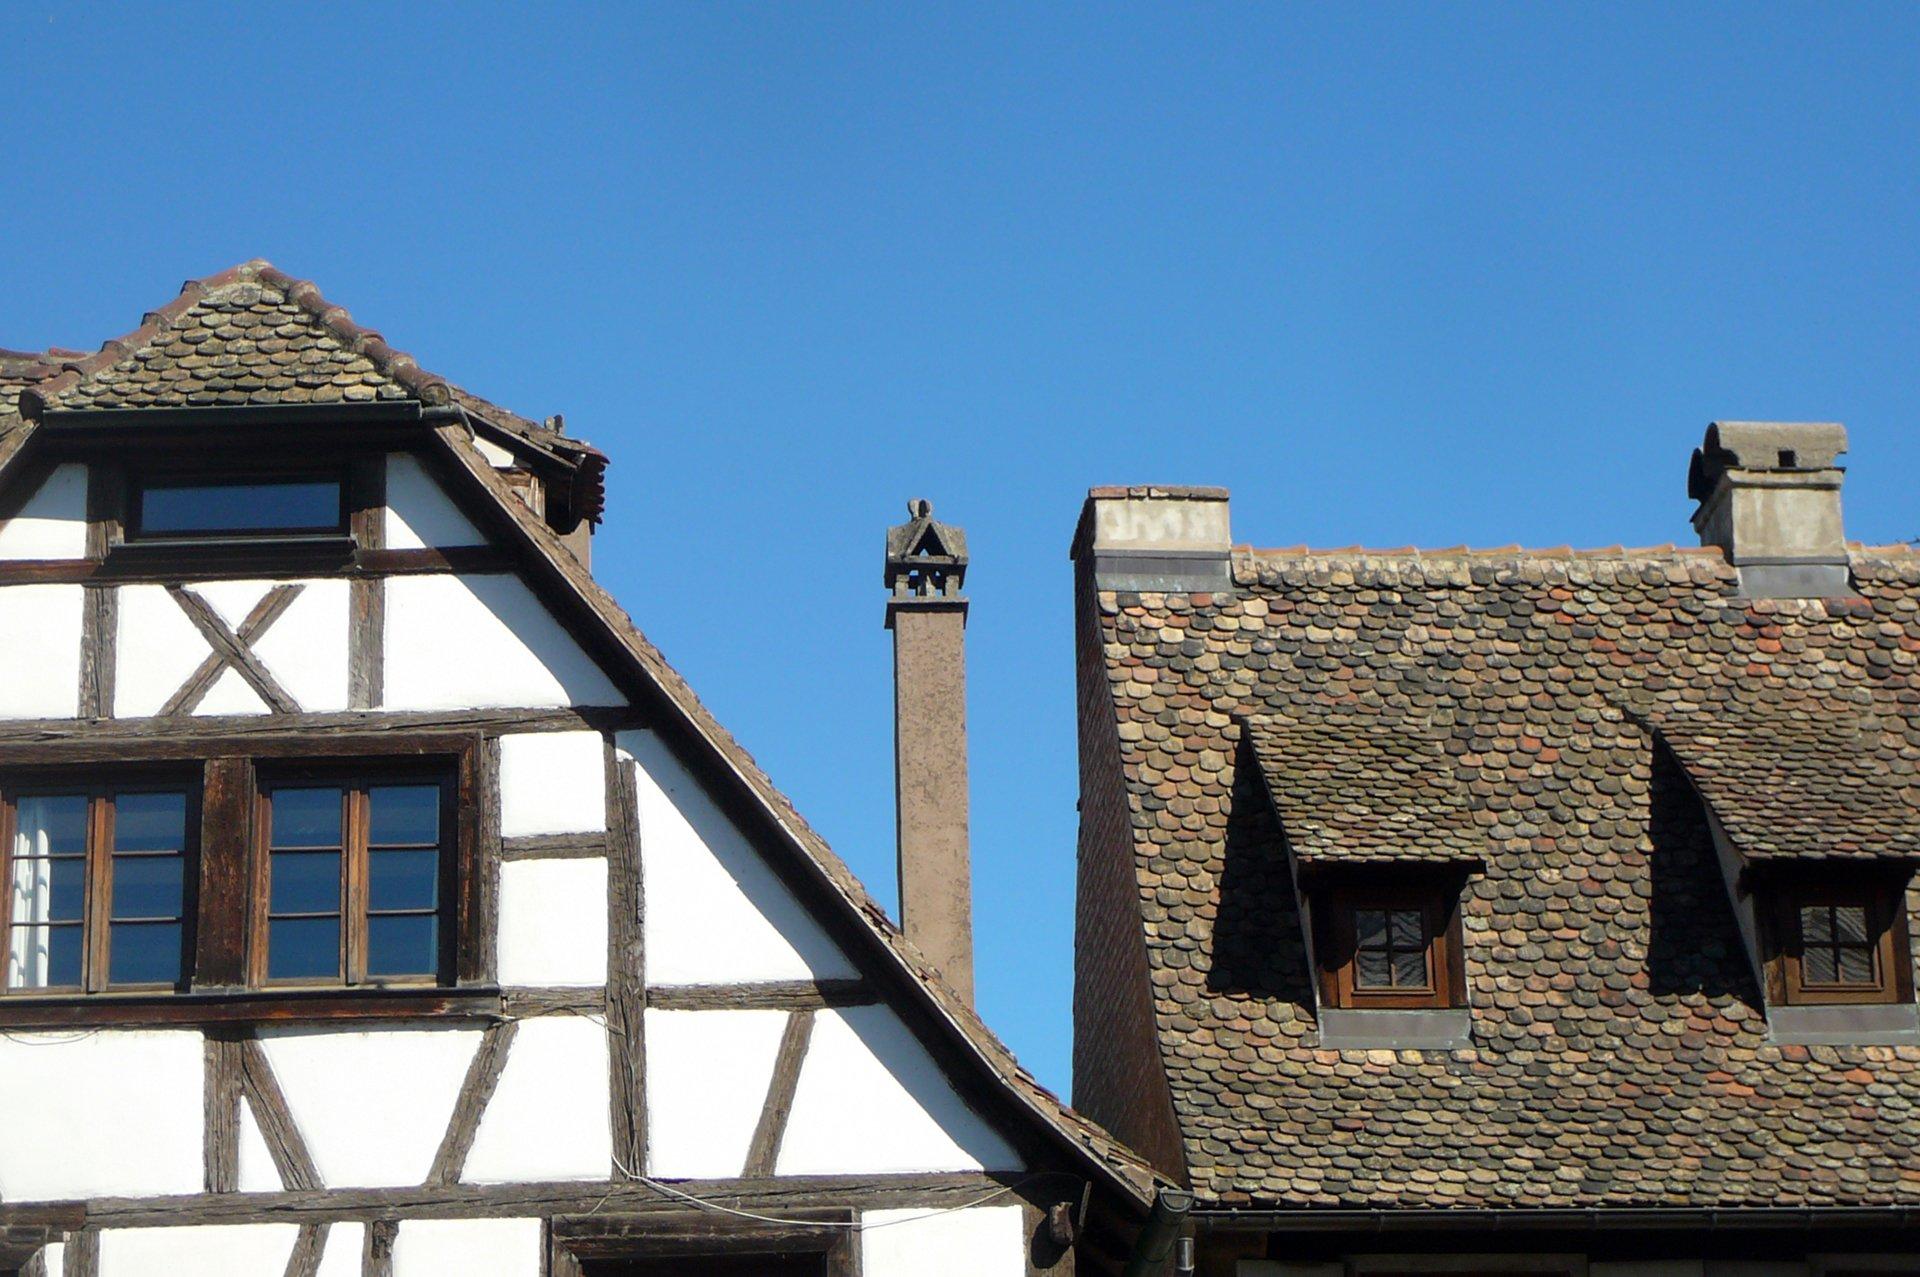 fotogena Akademie Fotoreise Strasbourg